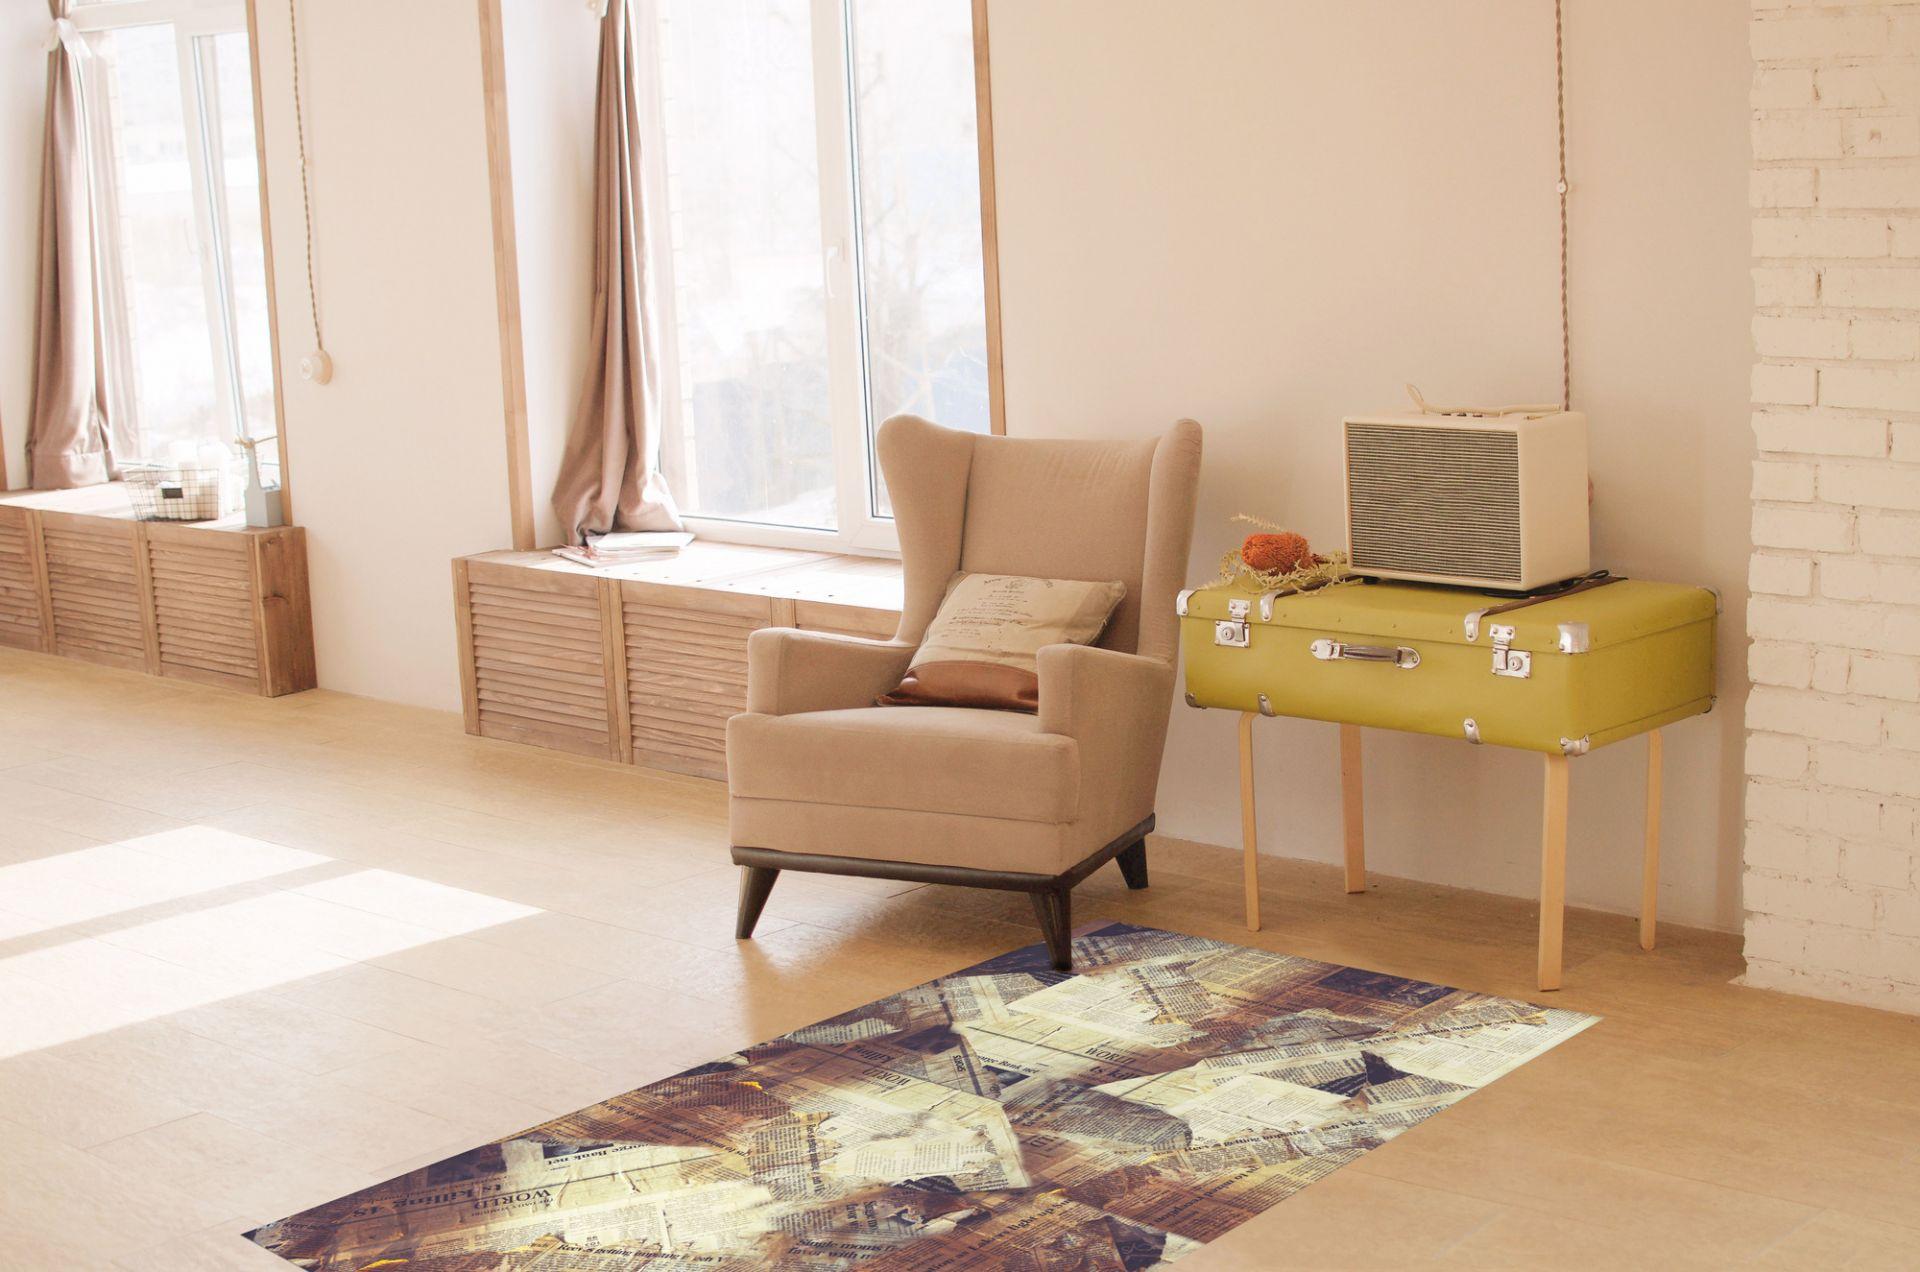 Matteo Vinyl Carpet Tiles used style Contento 60x90